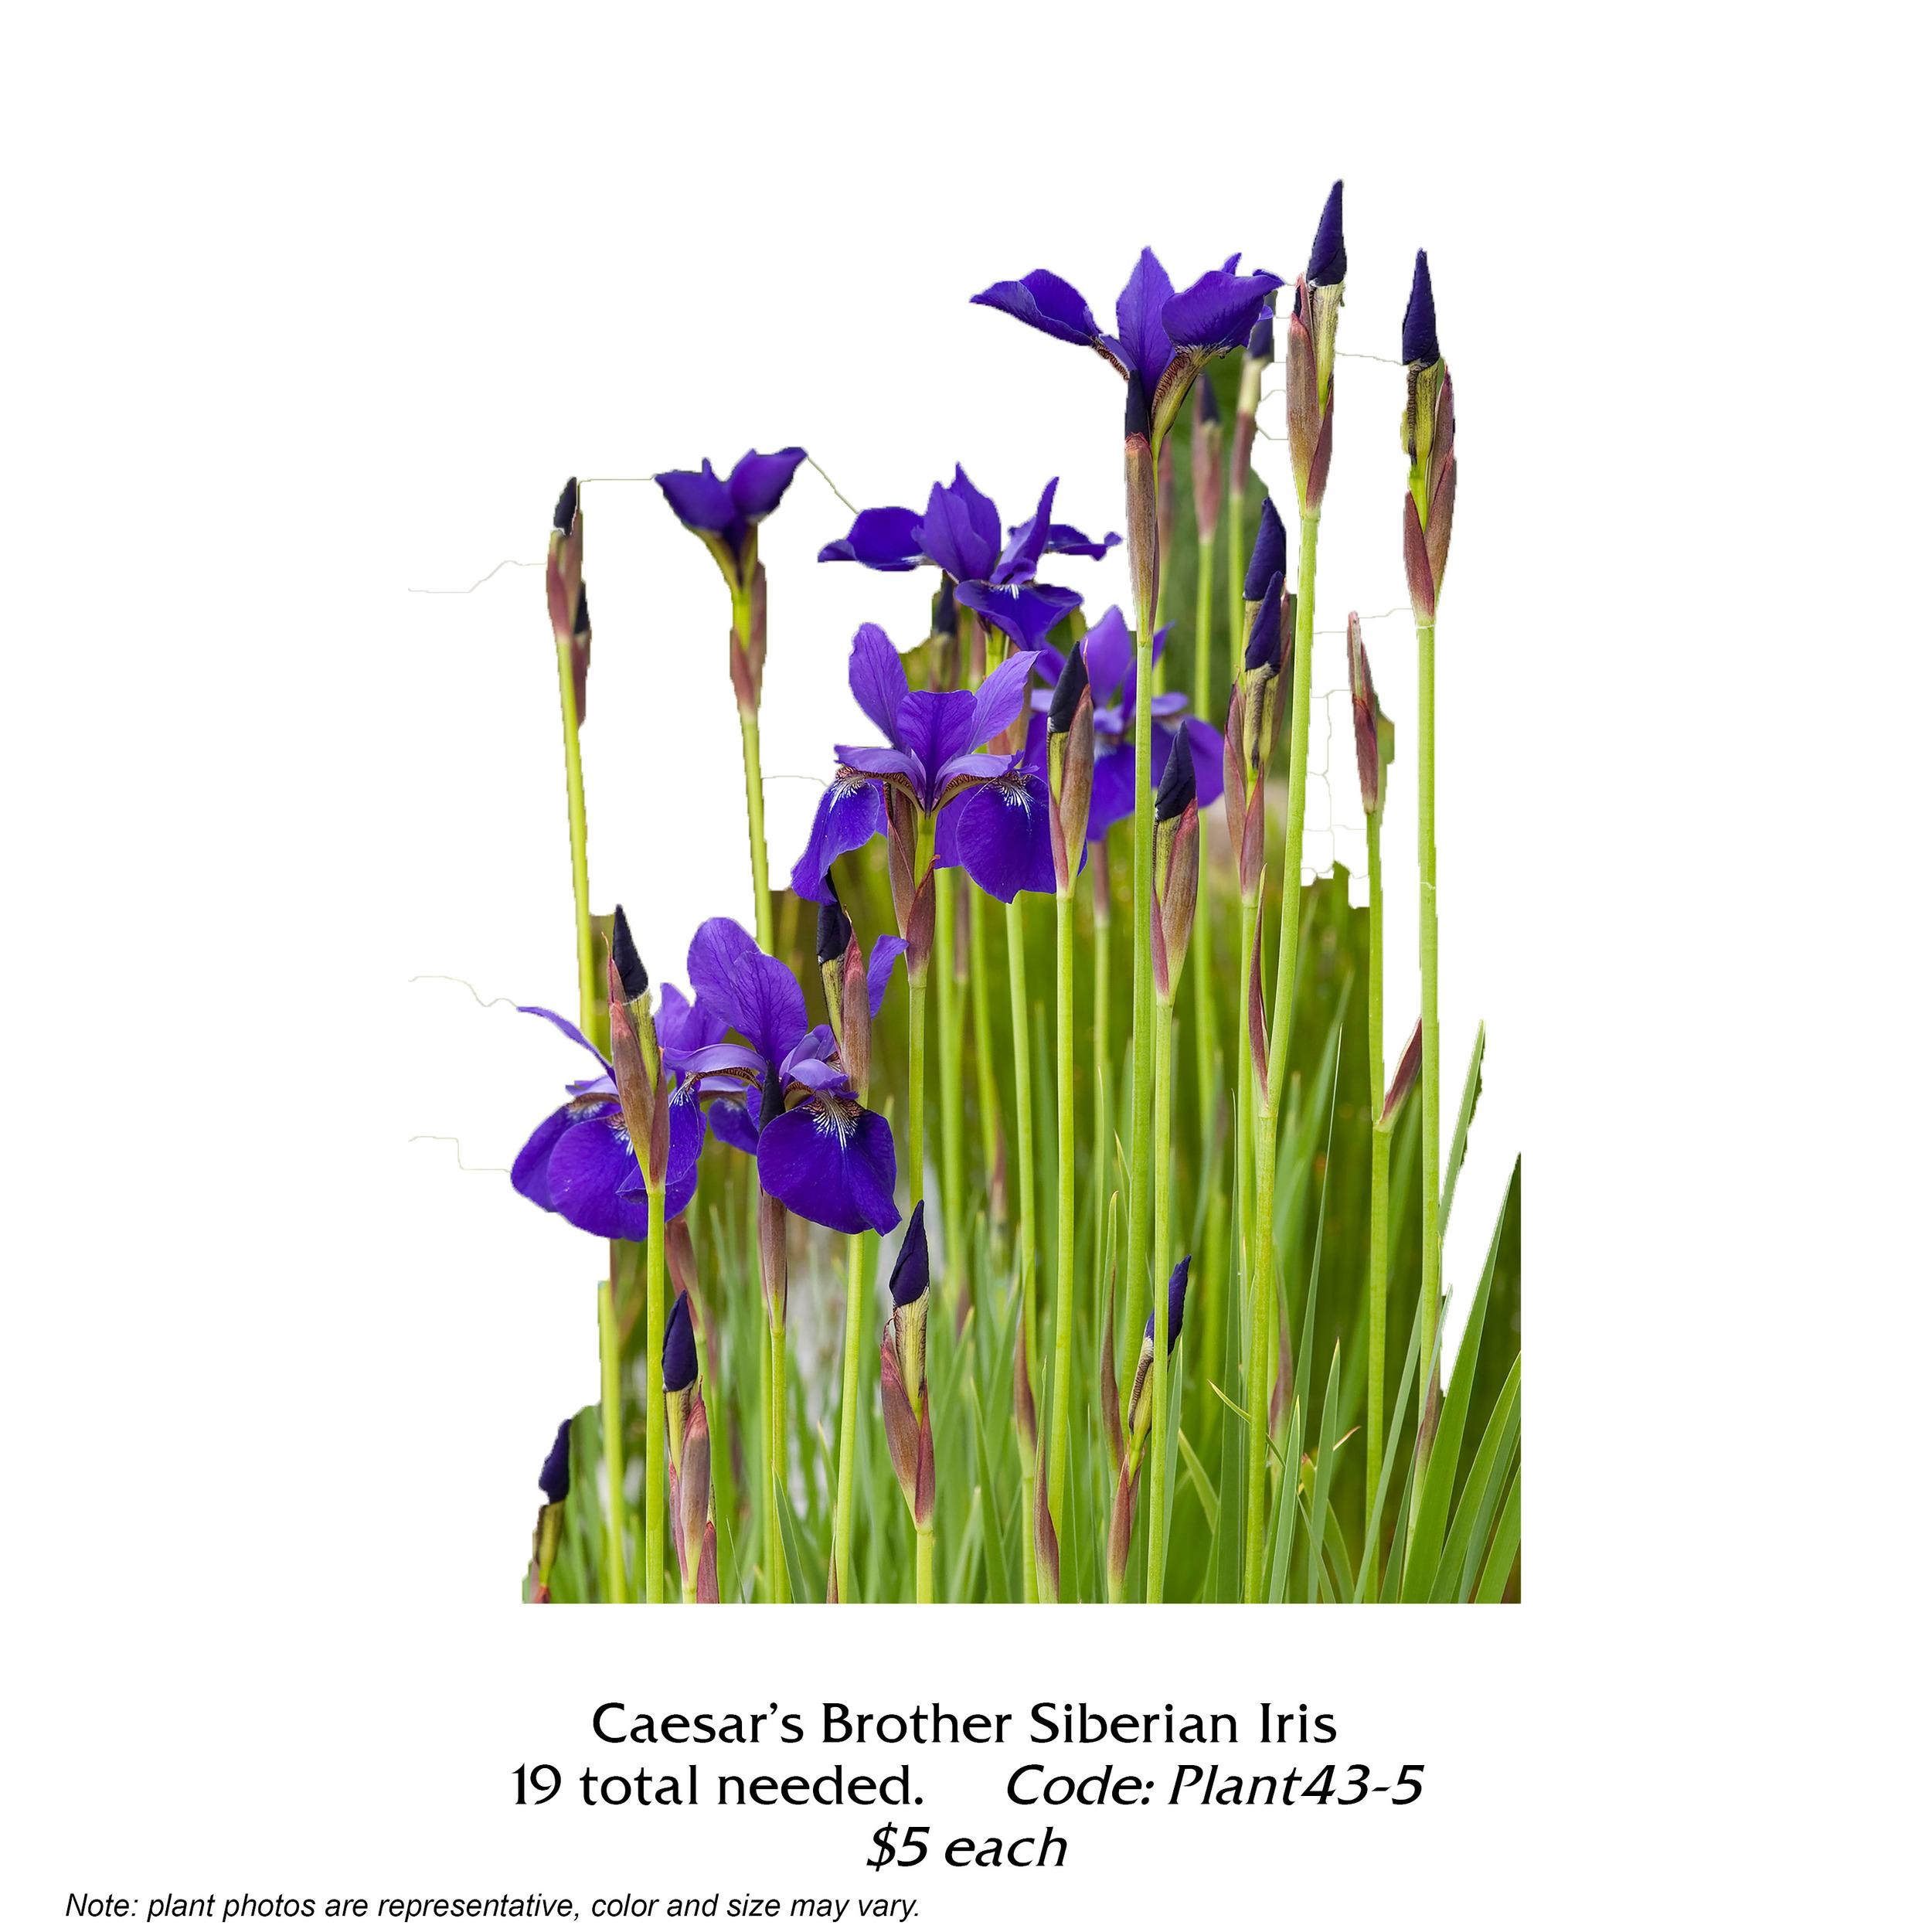 Caesars Brother Siberian Iris.jpg